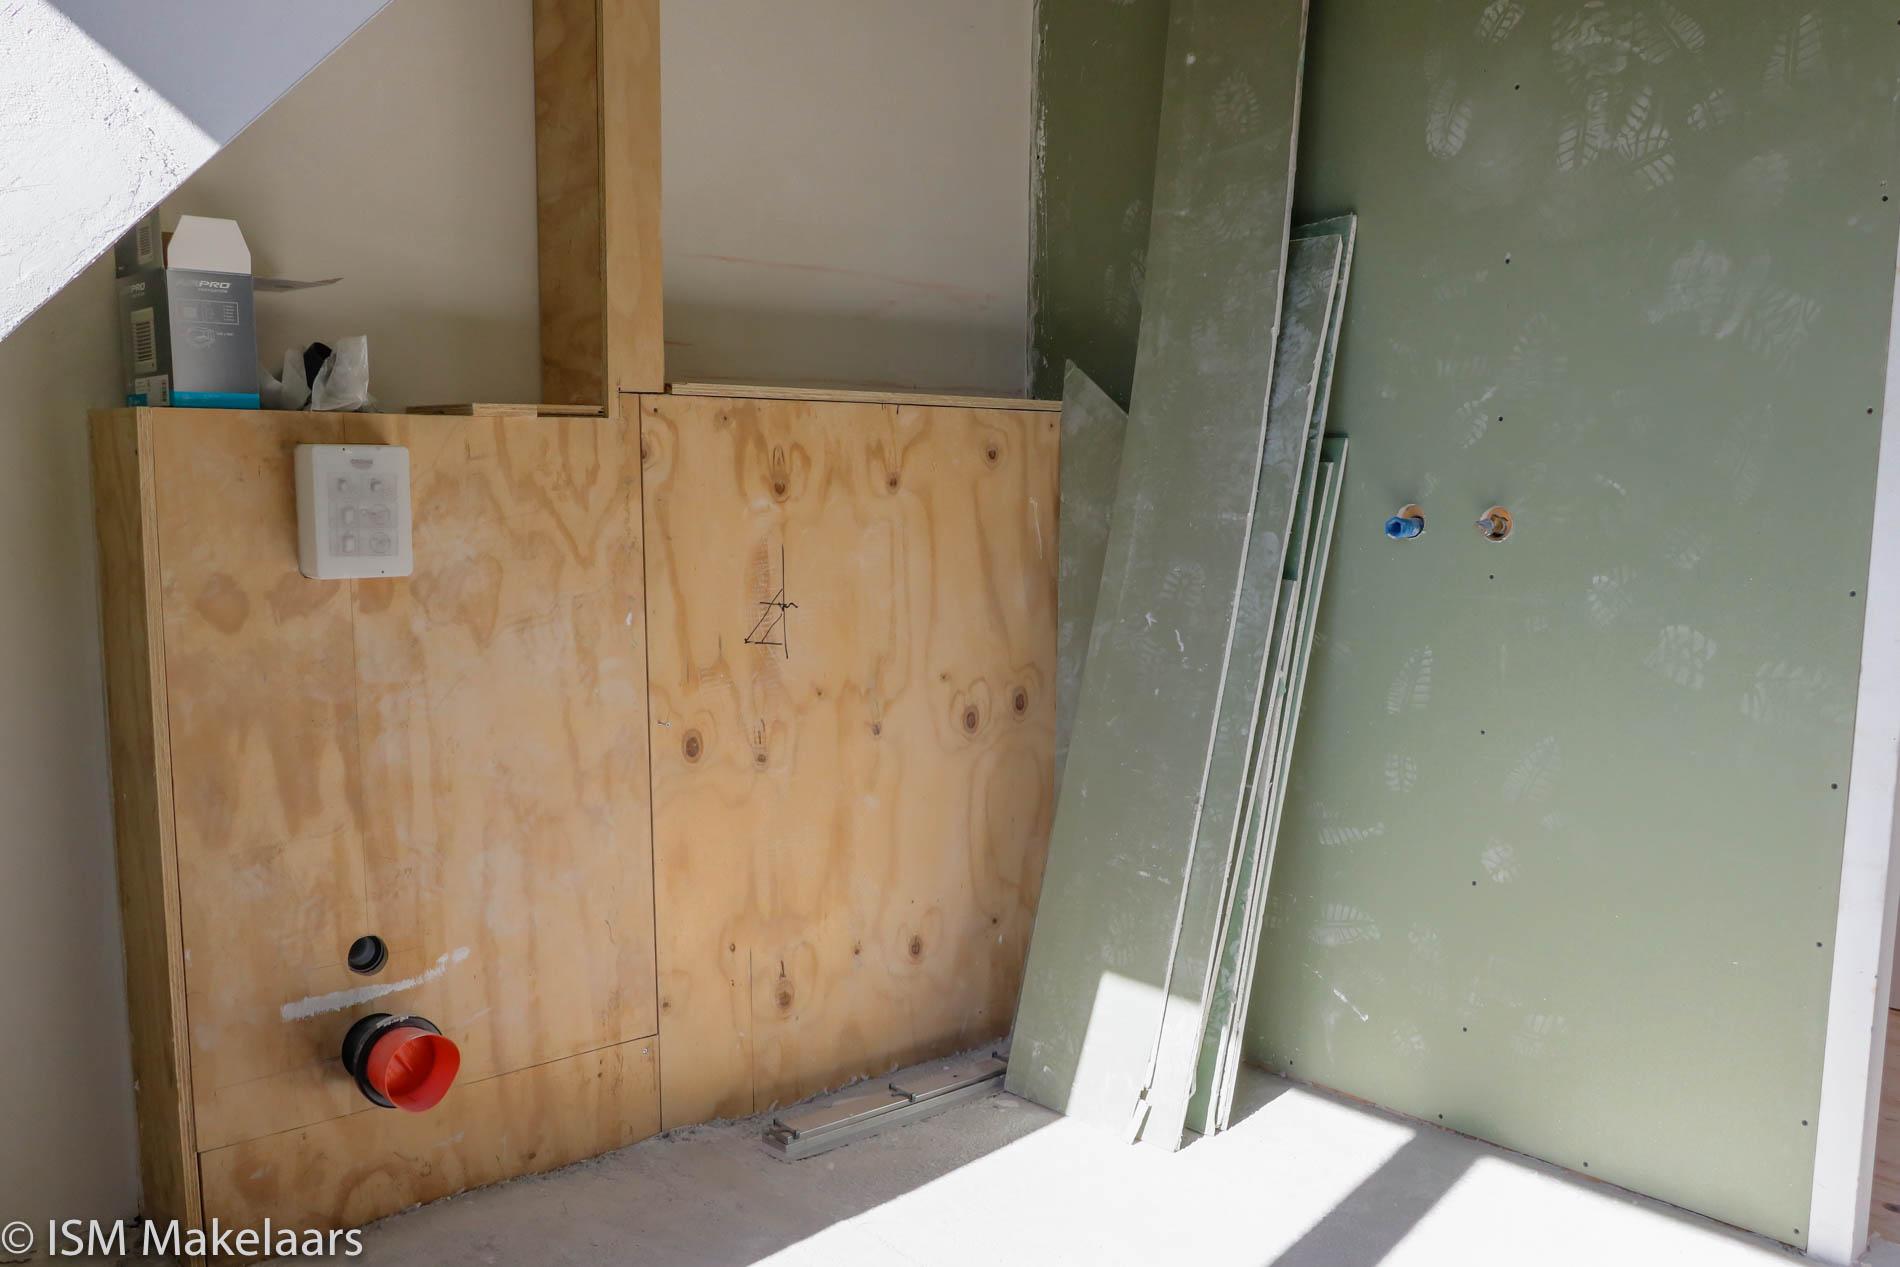 badkamer burchtstraat 28 oost-souburg ism makelaars